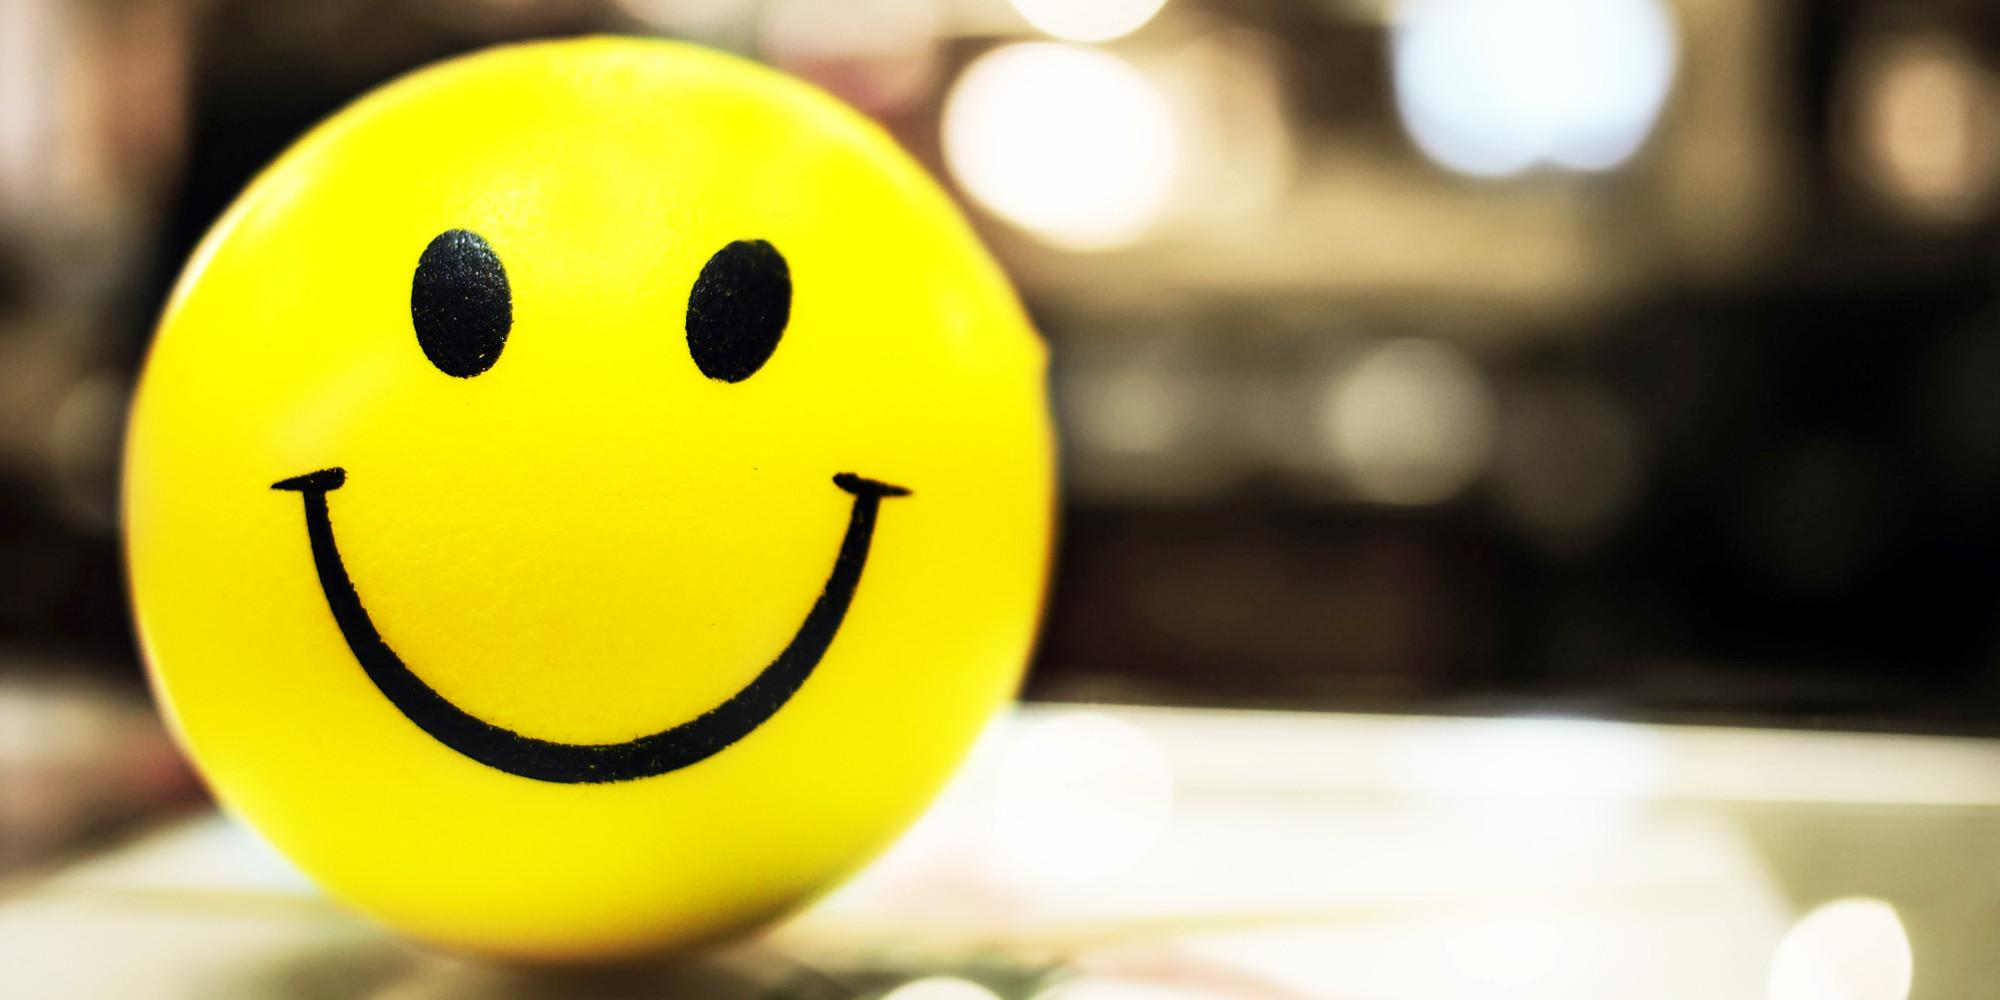 http://i.huffpost.com/gen/2828084/images/o-SMILING-facebook.jpg